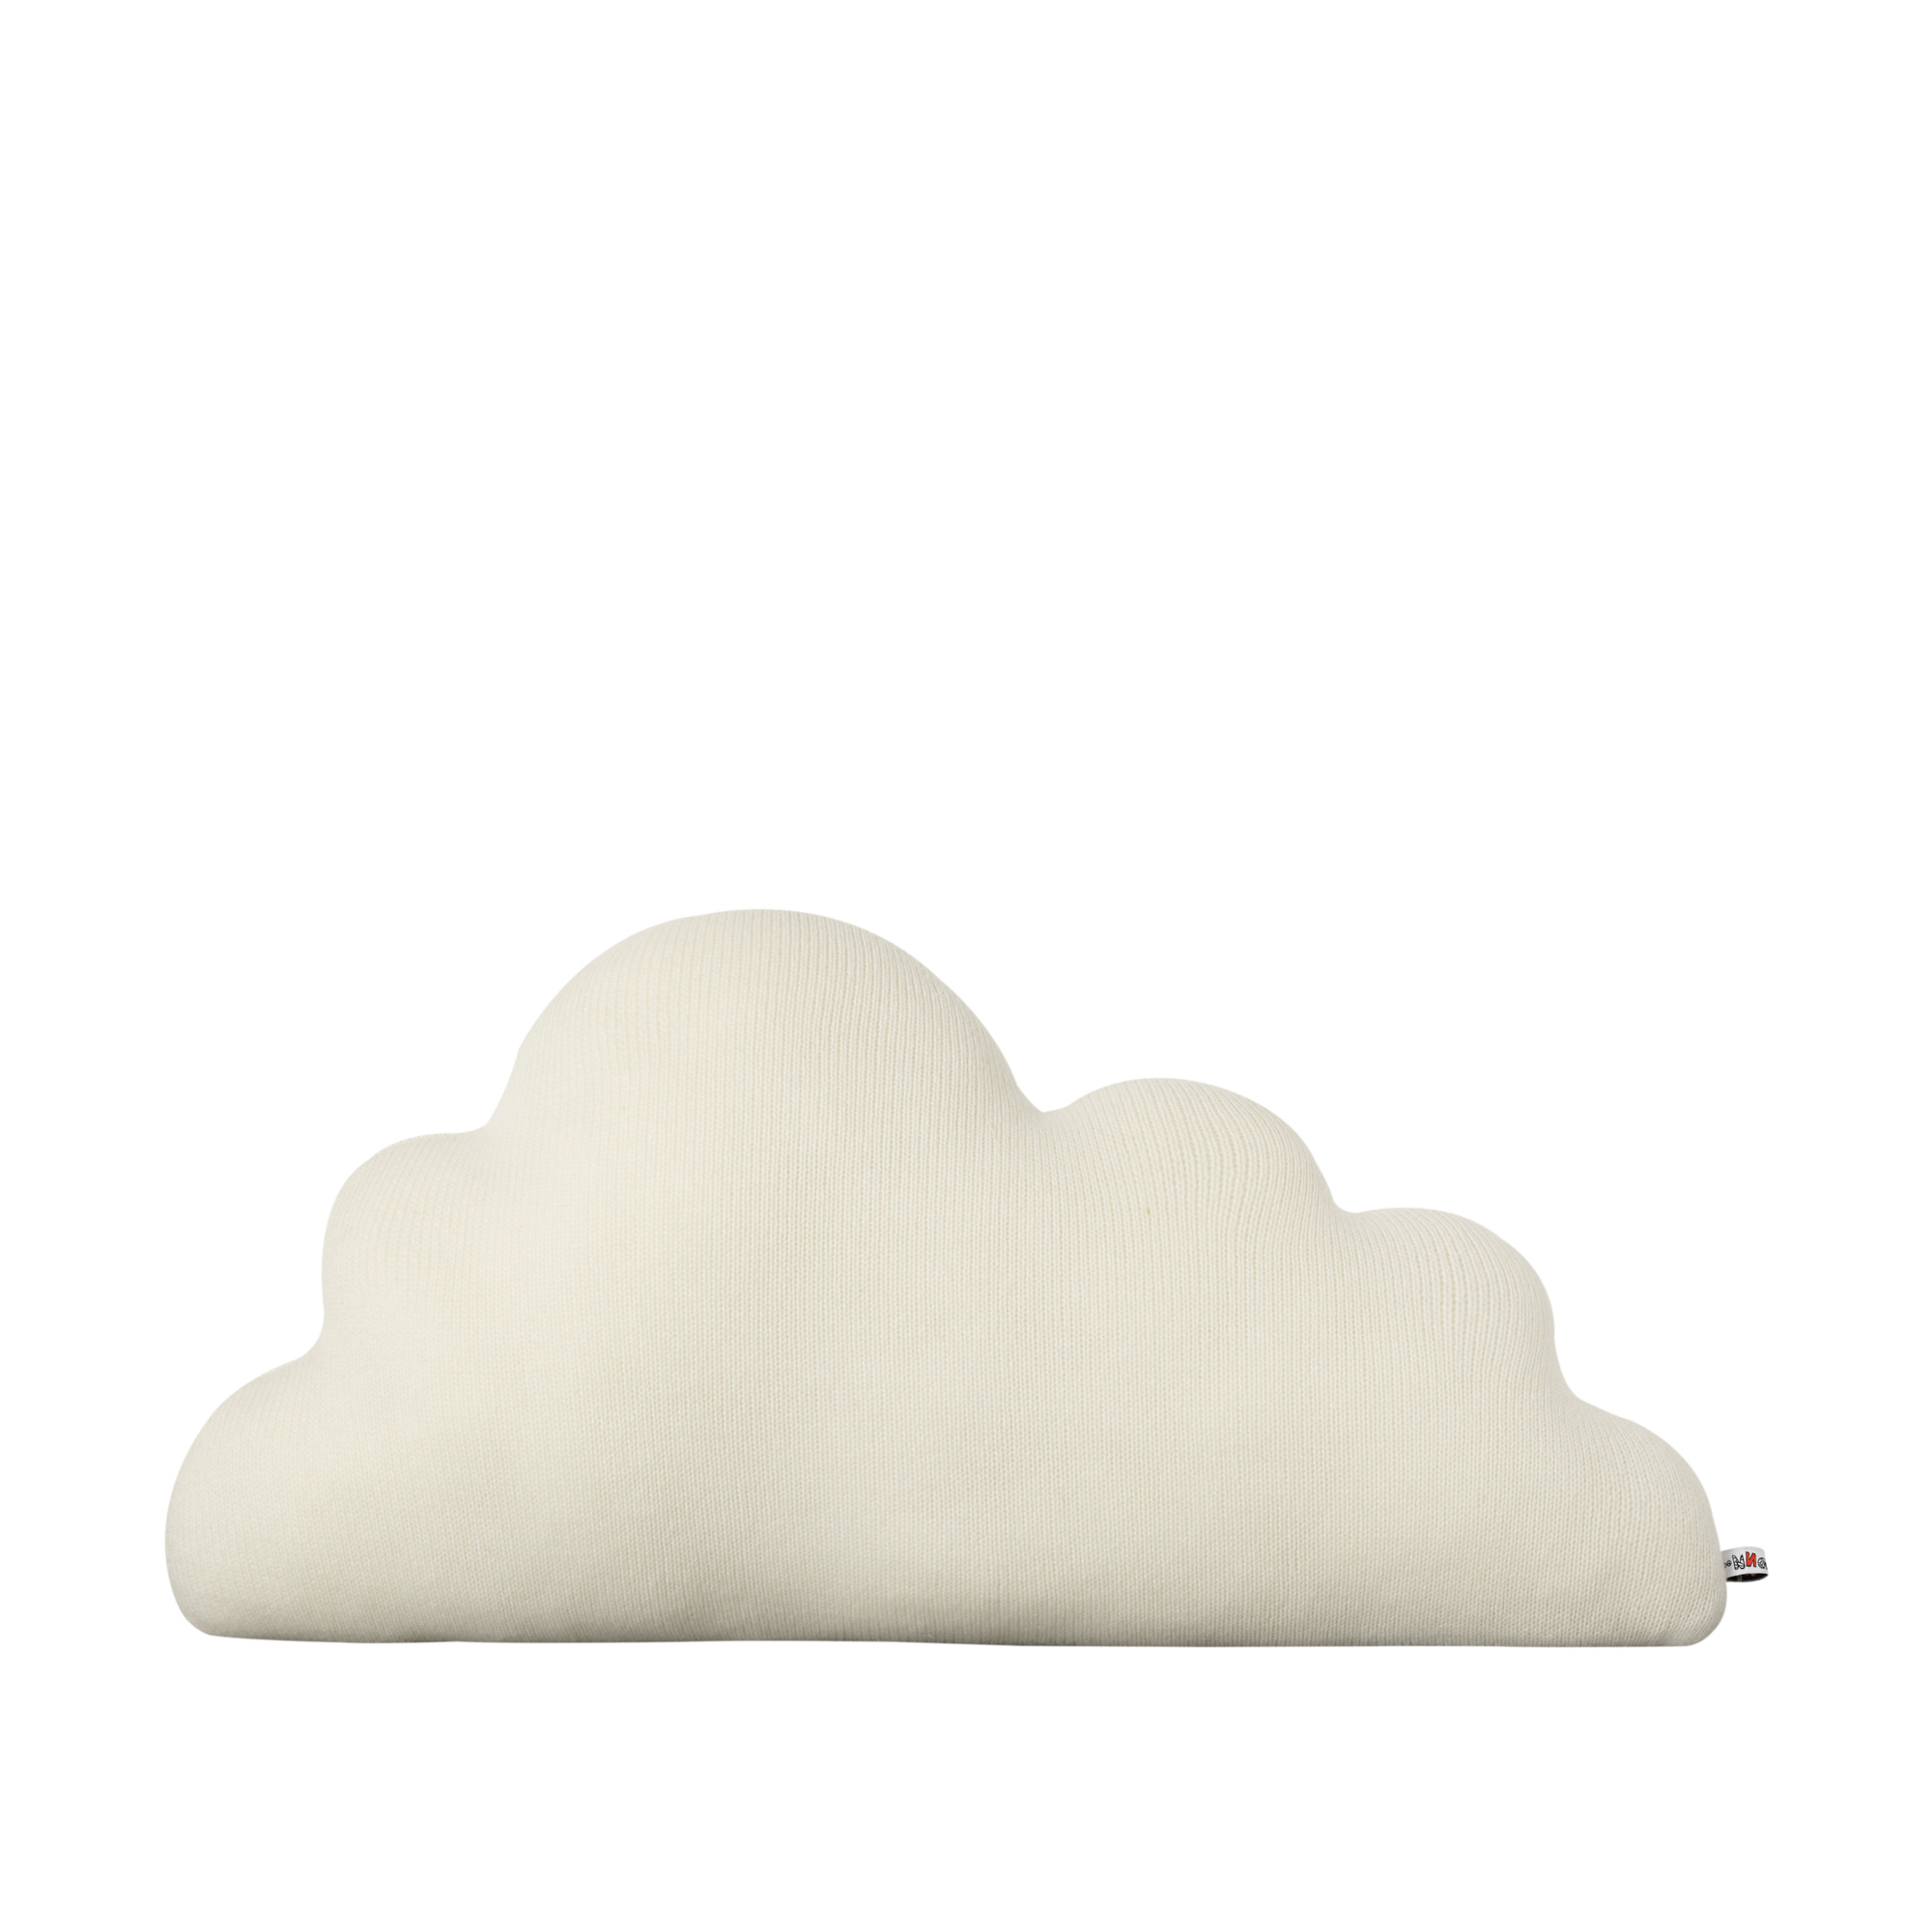 Cuddly Cloud Cushion Medium White By Donna Wilson Made